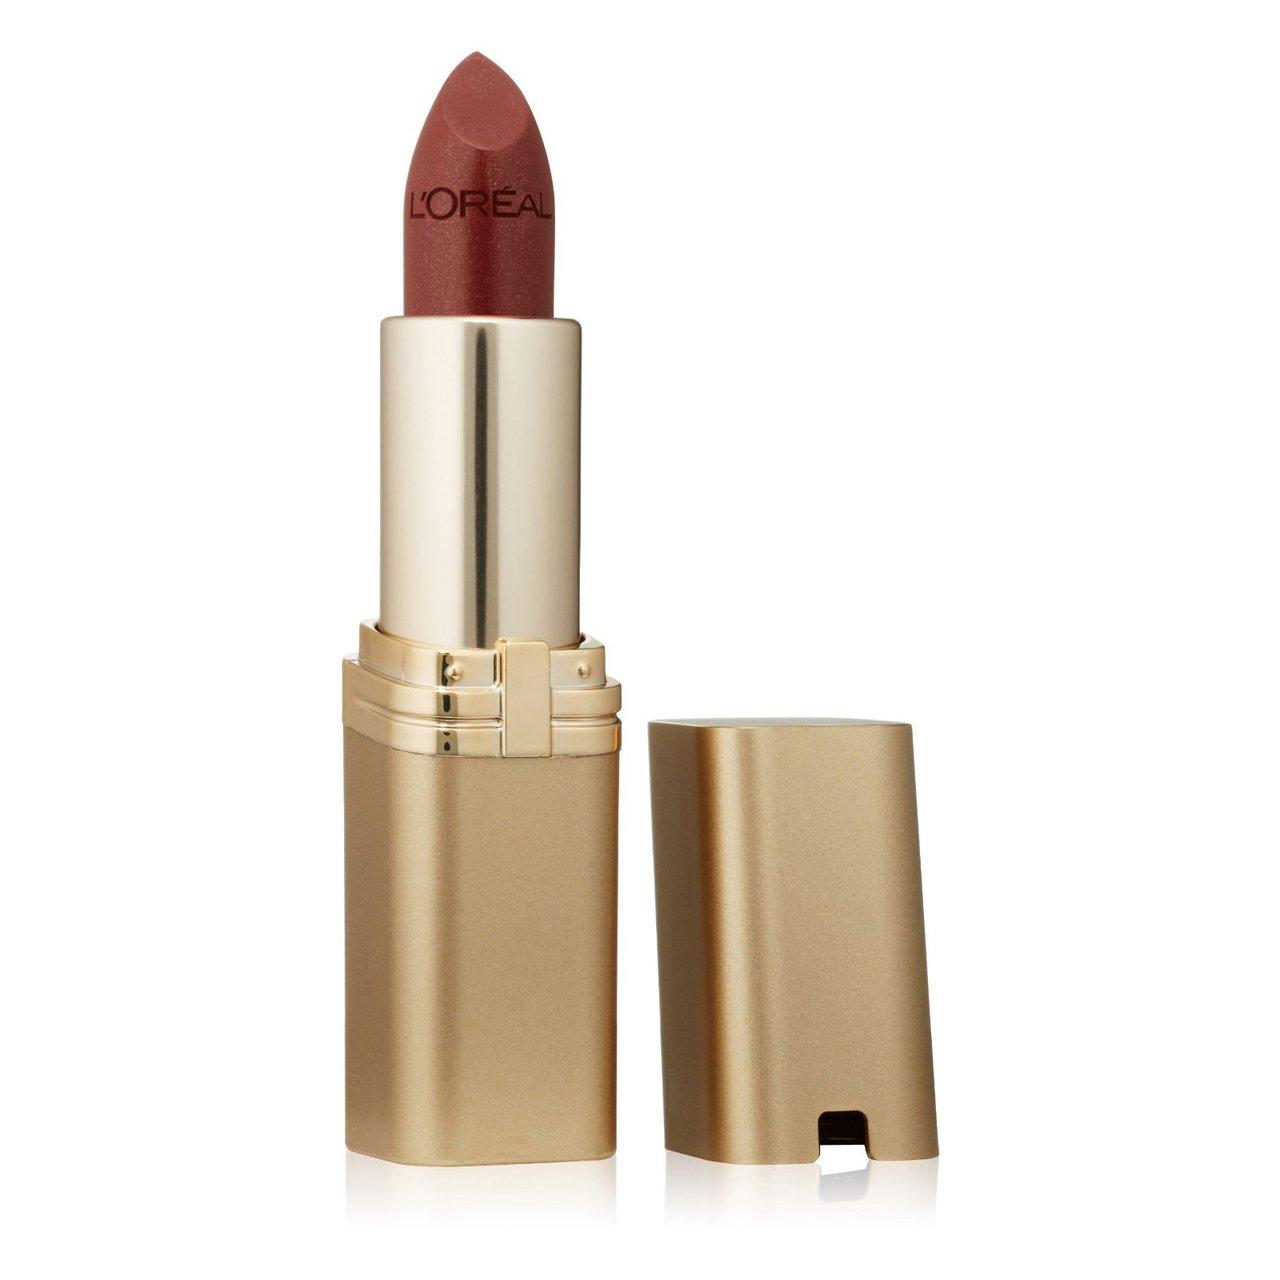 L'Oreal Color Riche Lip Color Sunwash 857 (1-Pack)